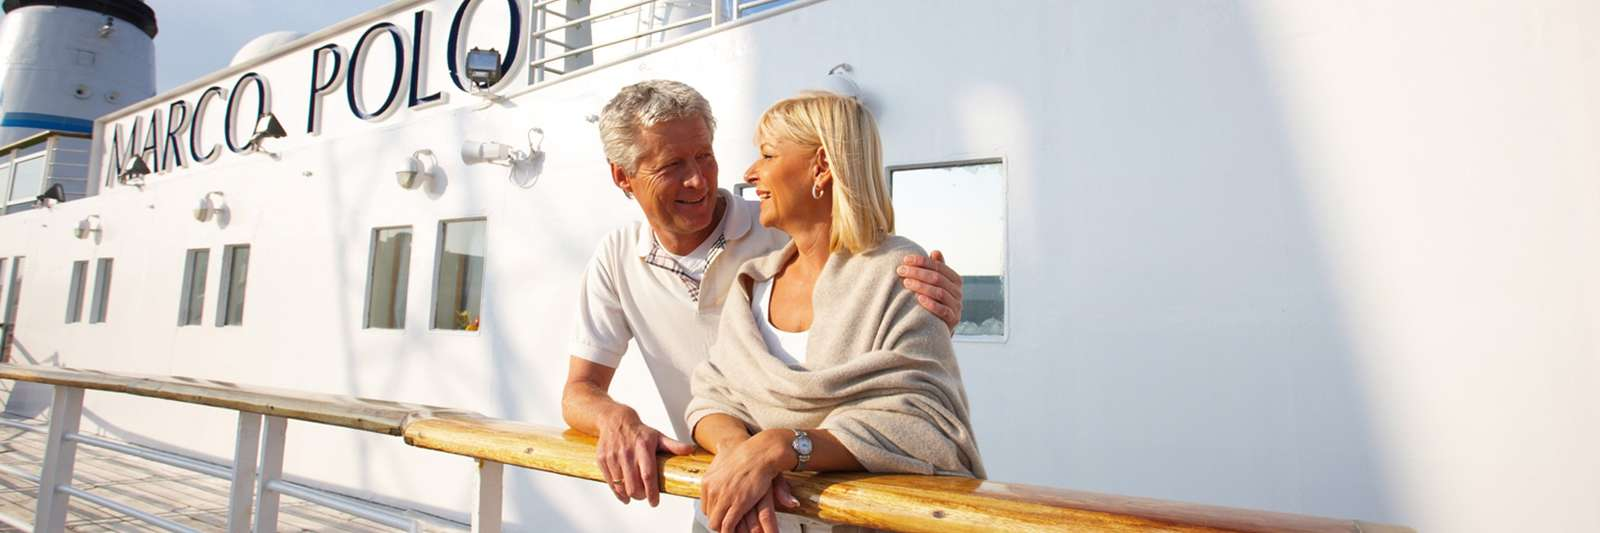 Cruise and Maritime Cruises